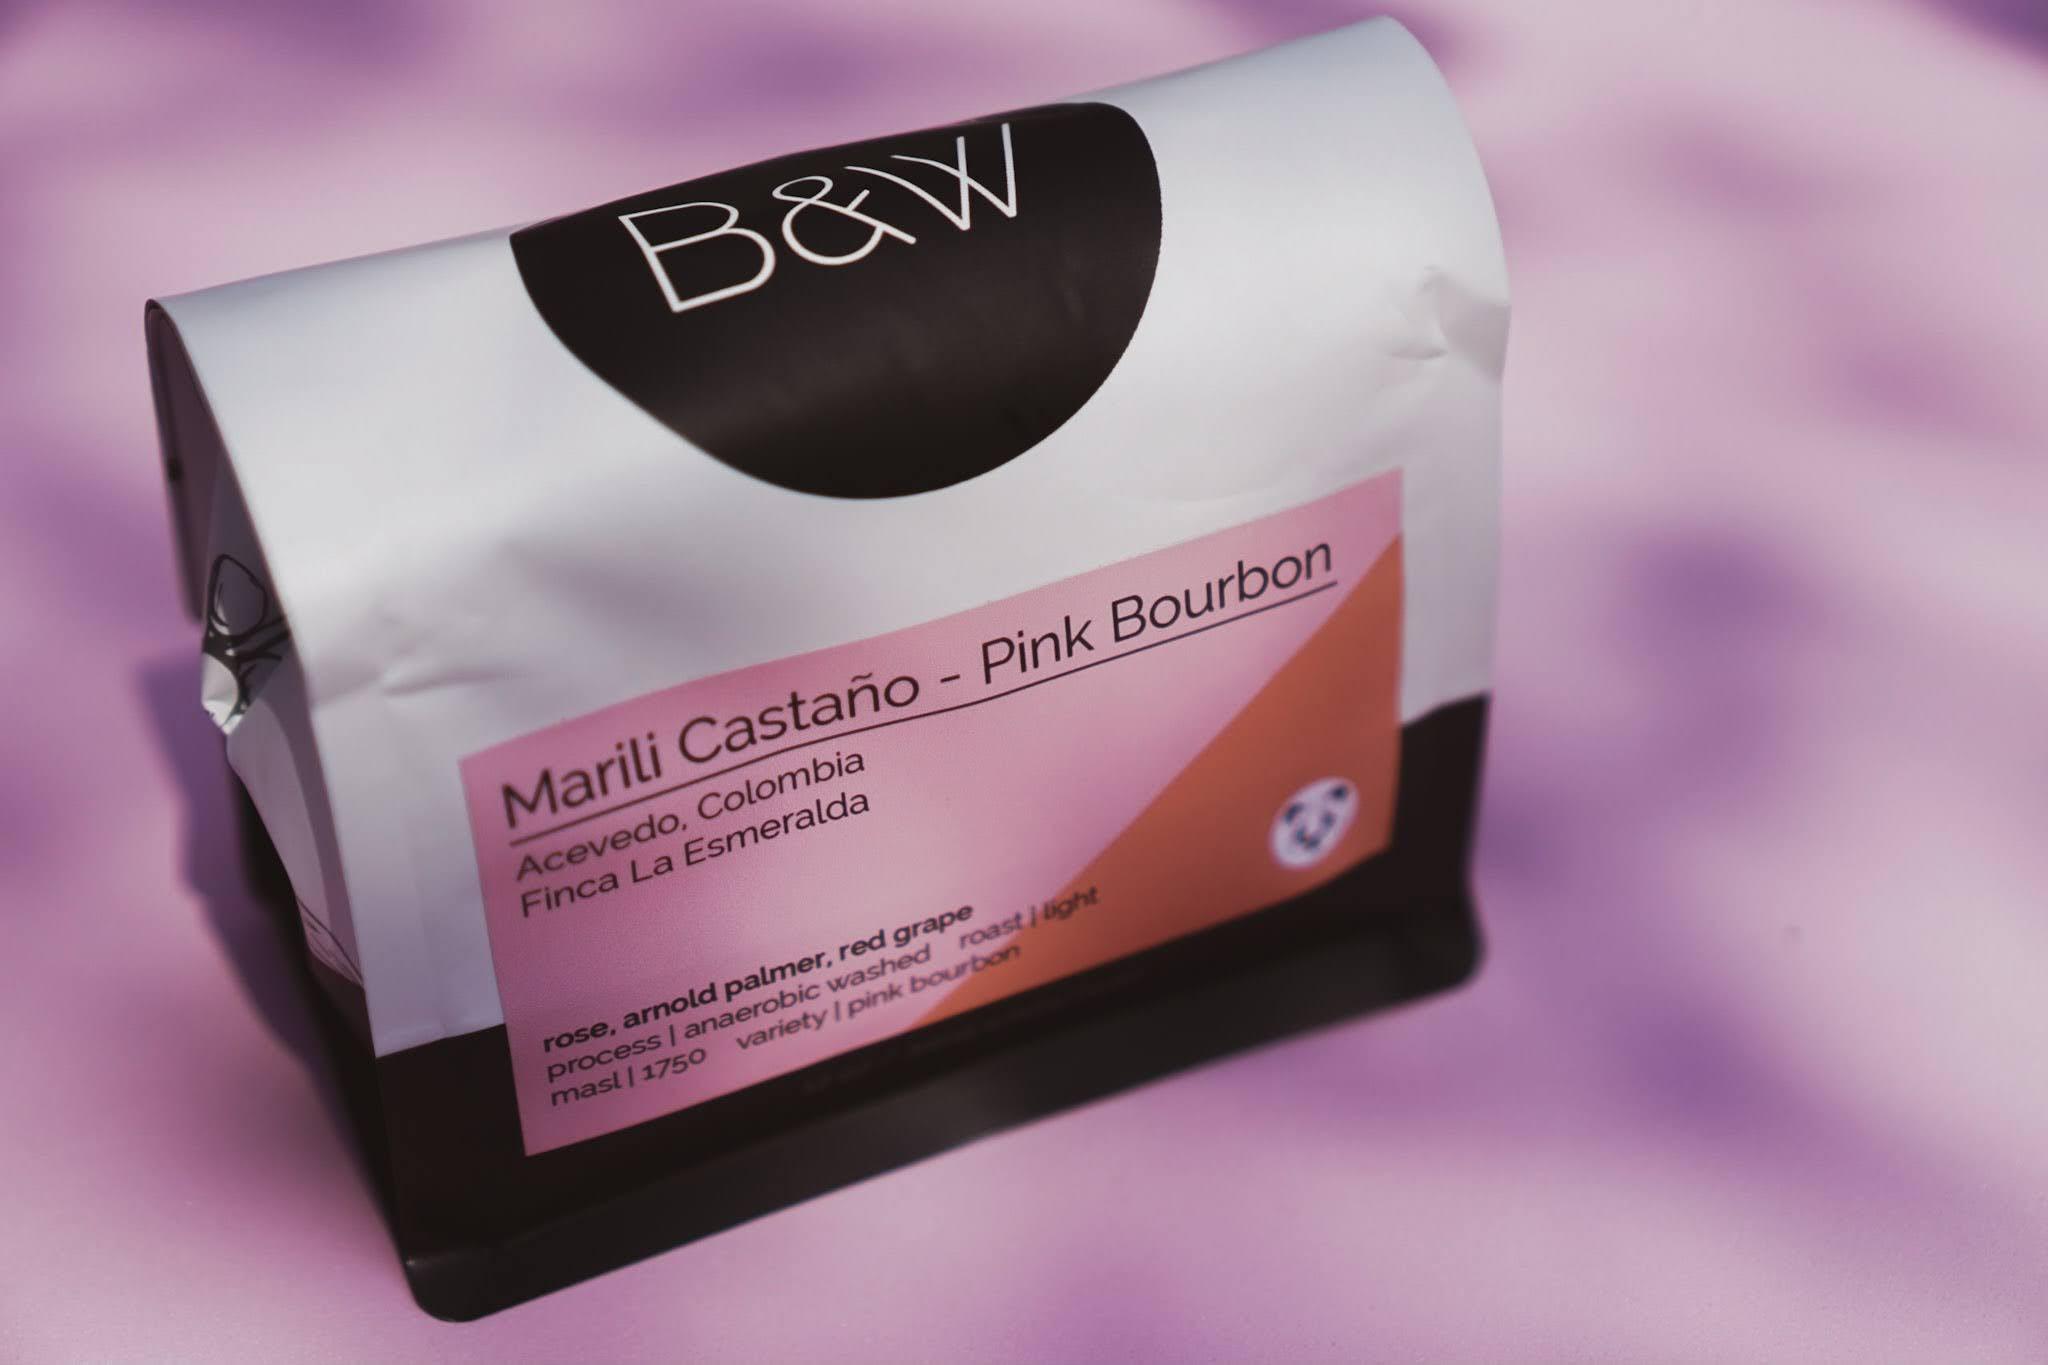 Black and White Coffee Roasters // Colombia Marili Castaño – Pink Bourbon